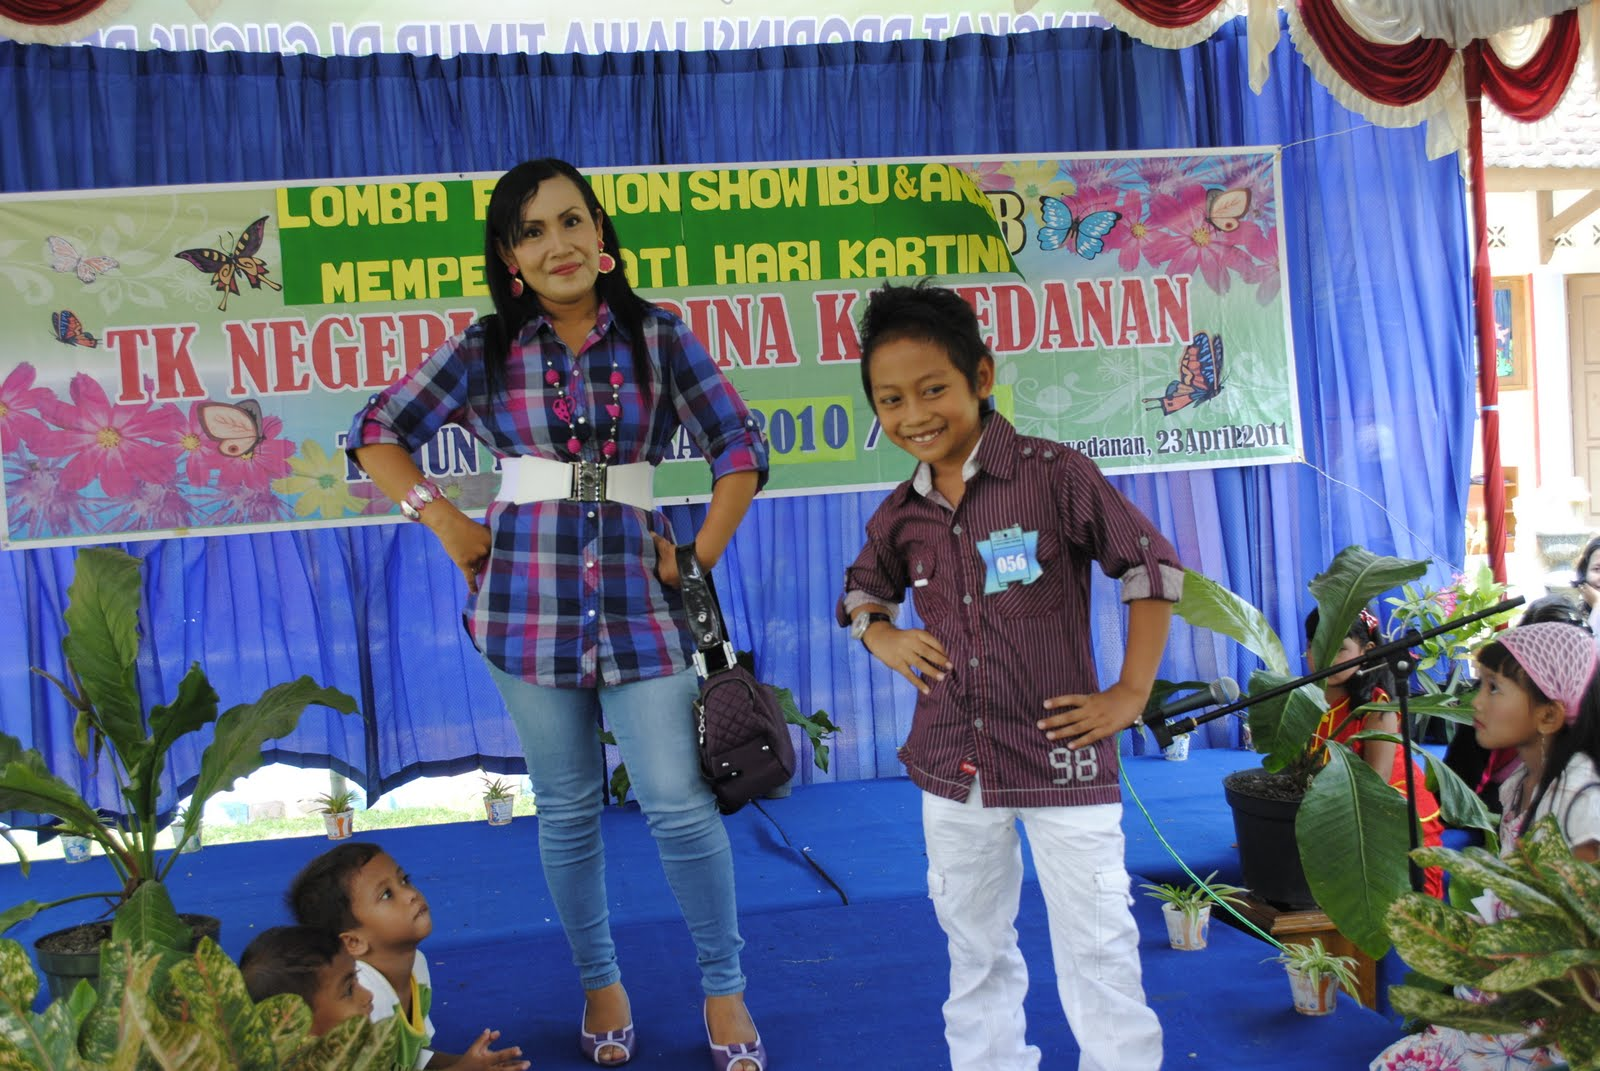 Lomba Fashion Ibu & Anak dlm Rangka Hari Karini